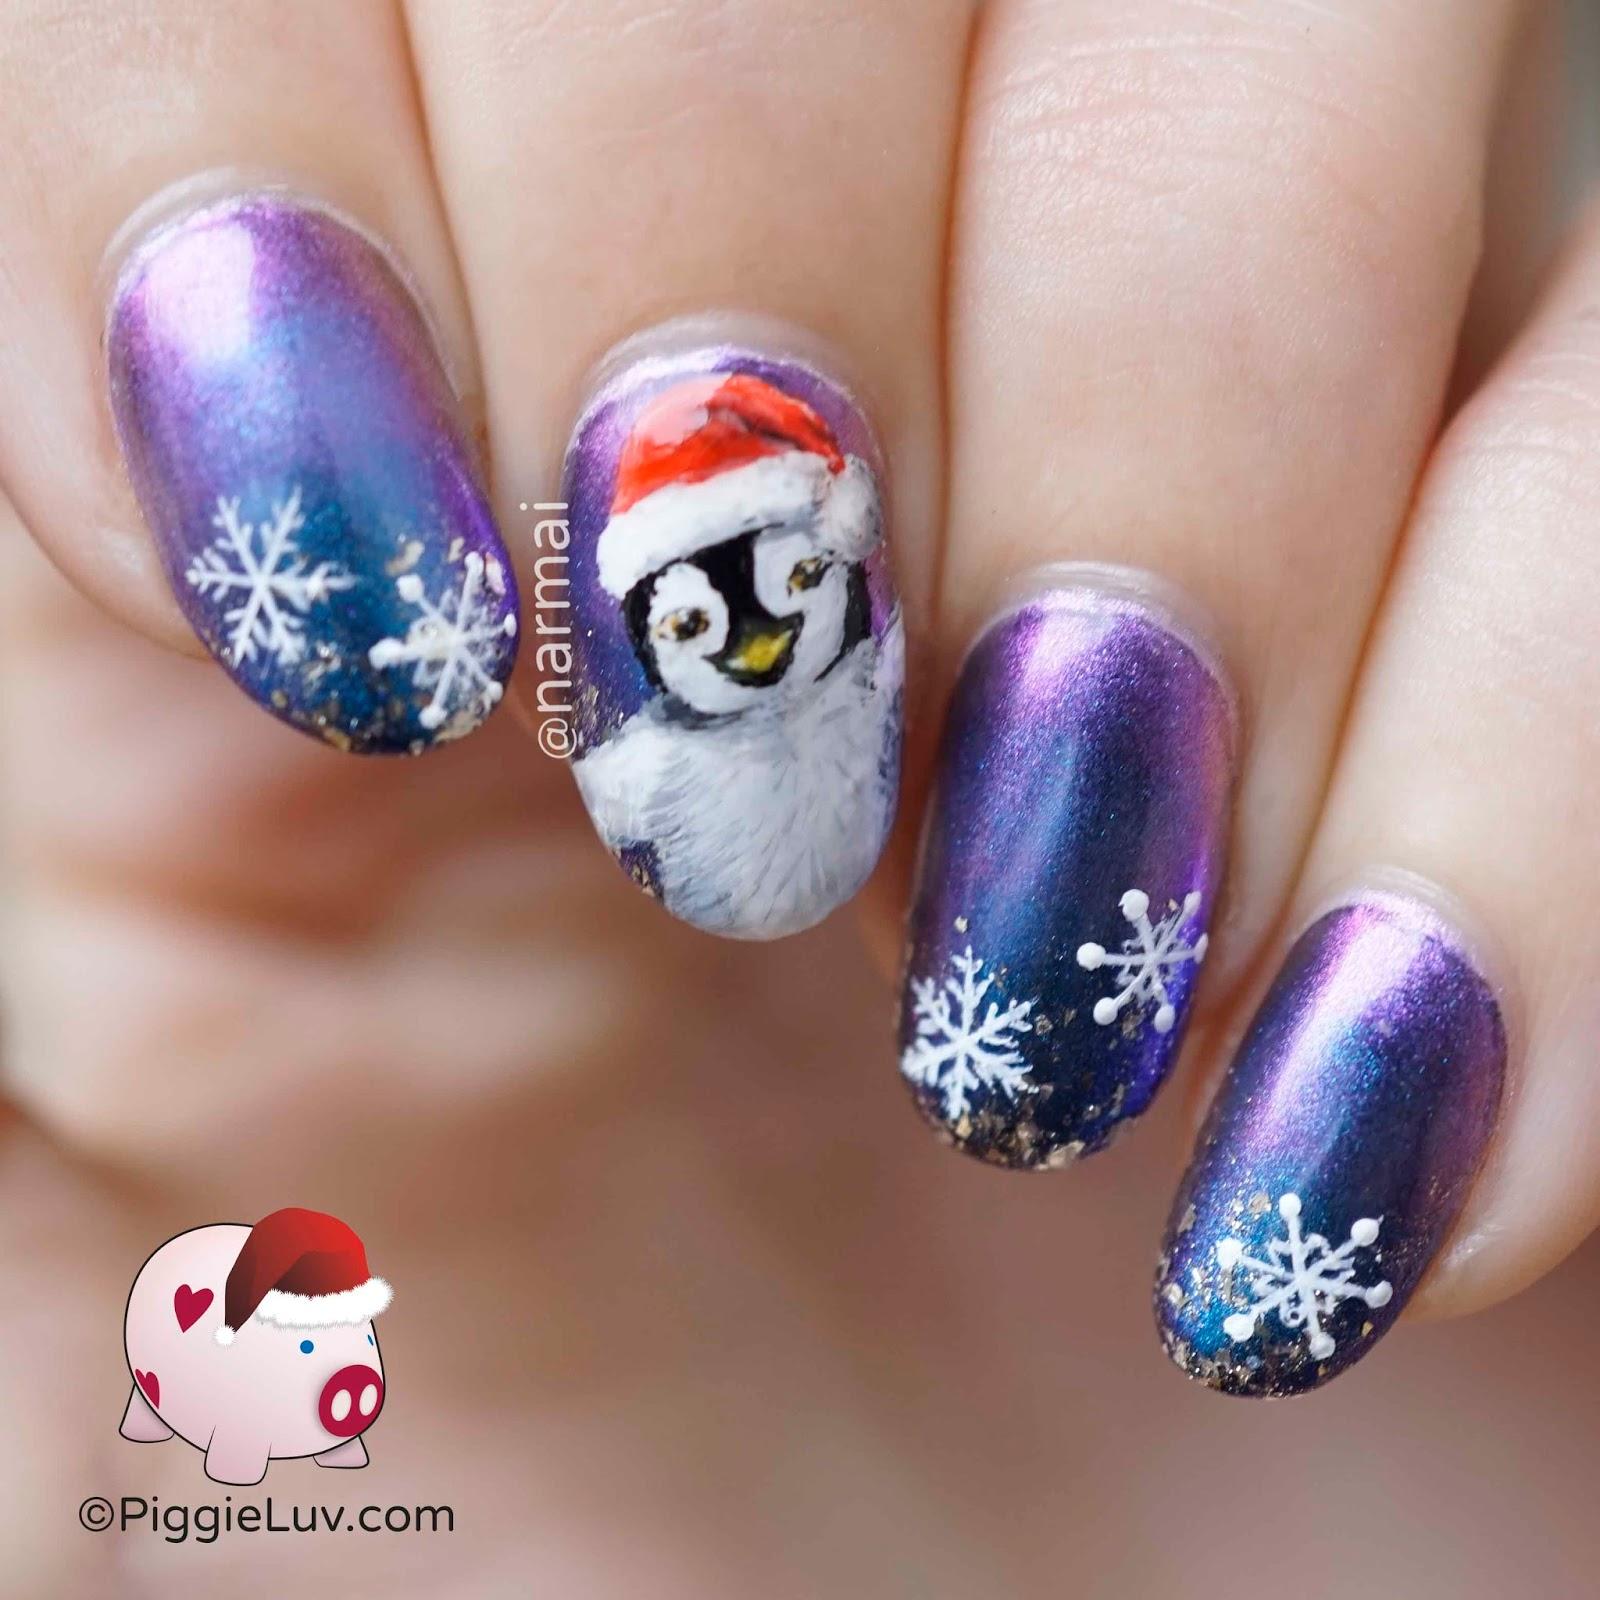 PiggieLuv: Happy Christmas penguin nail art